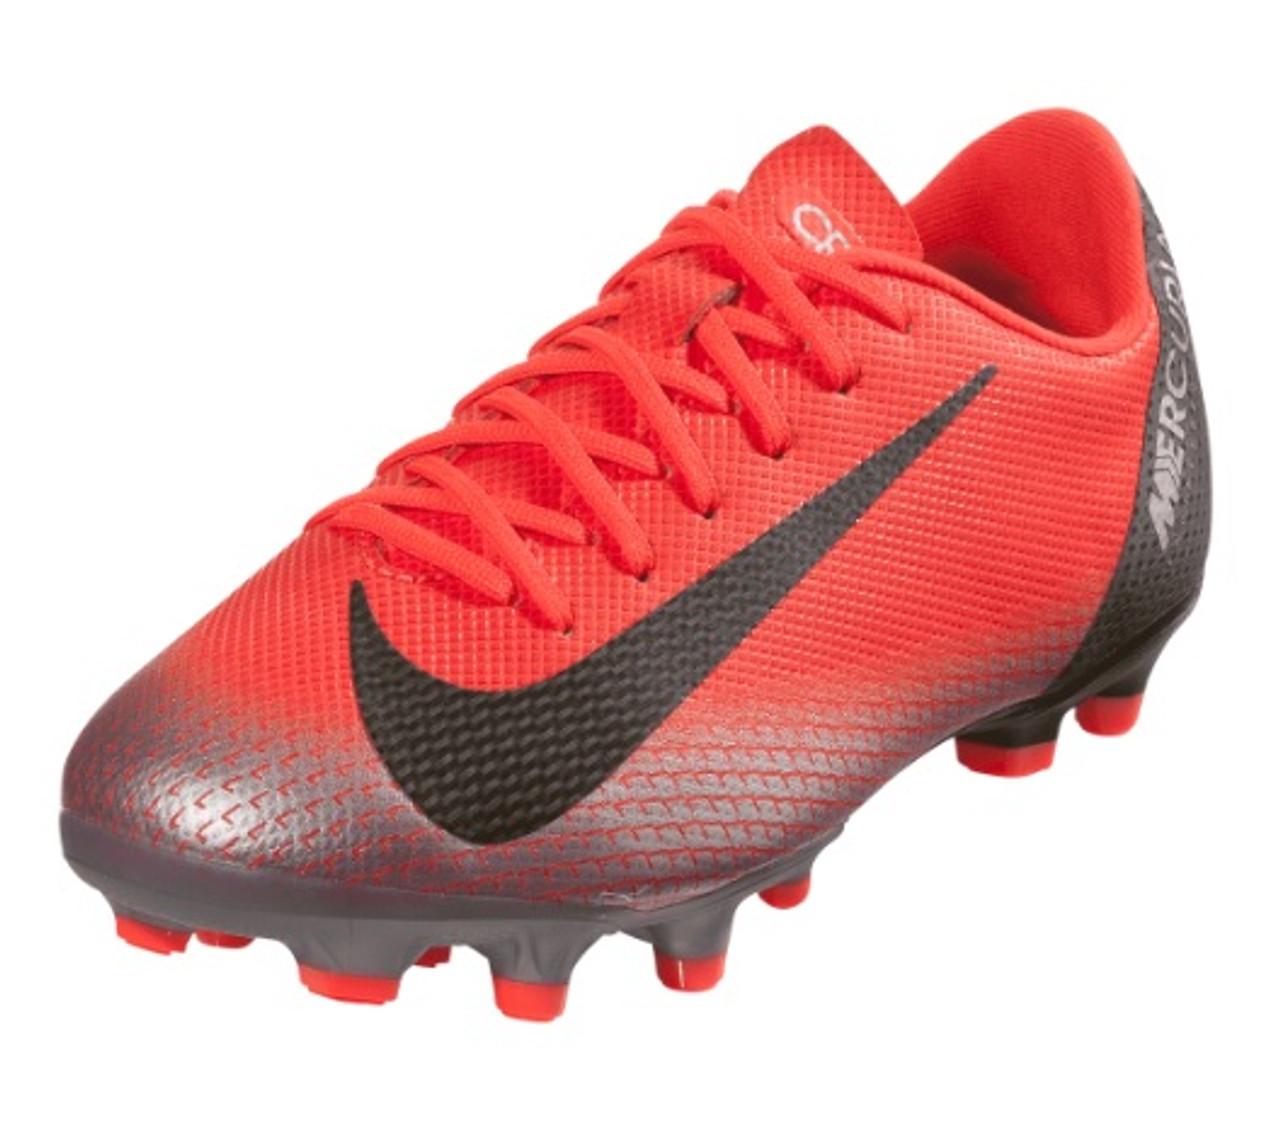 best loved 3b19d be45b Nike Junior Mercurial Vapor 12 Academy GS CR7 FG/MG - Bright  Crimson/Black/Chrome/Dark Grey (052119)